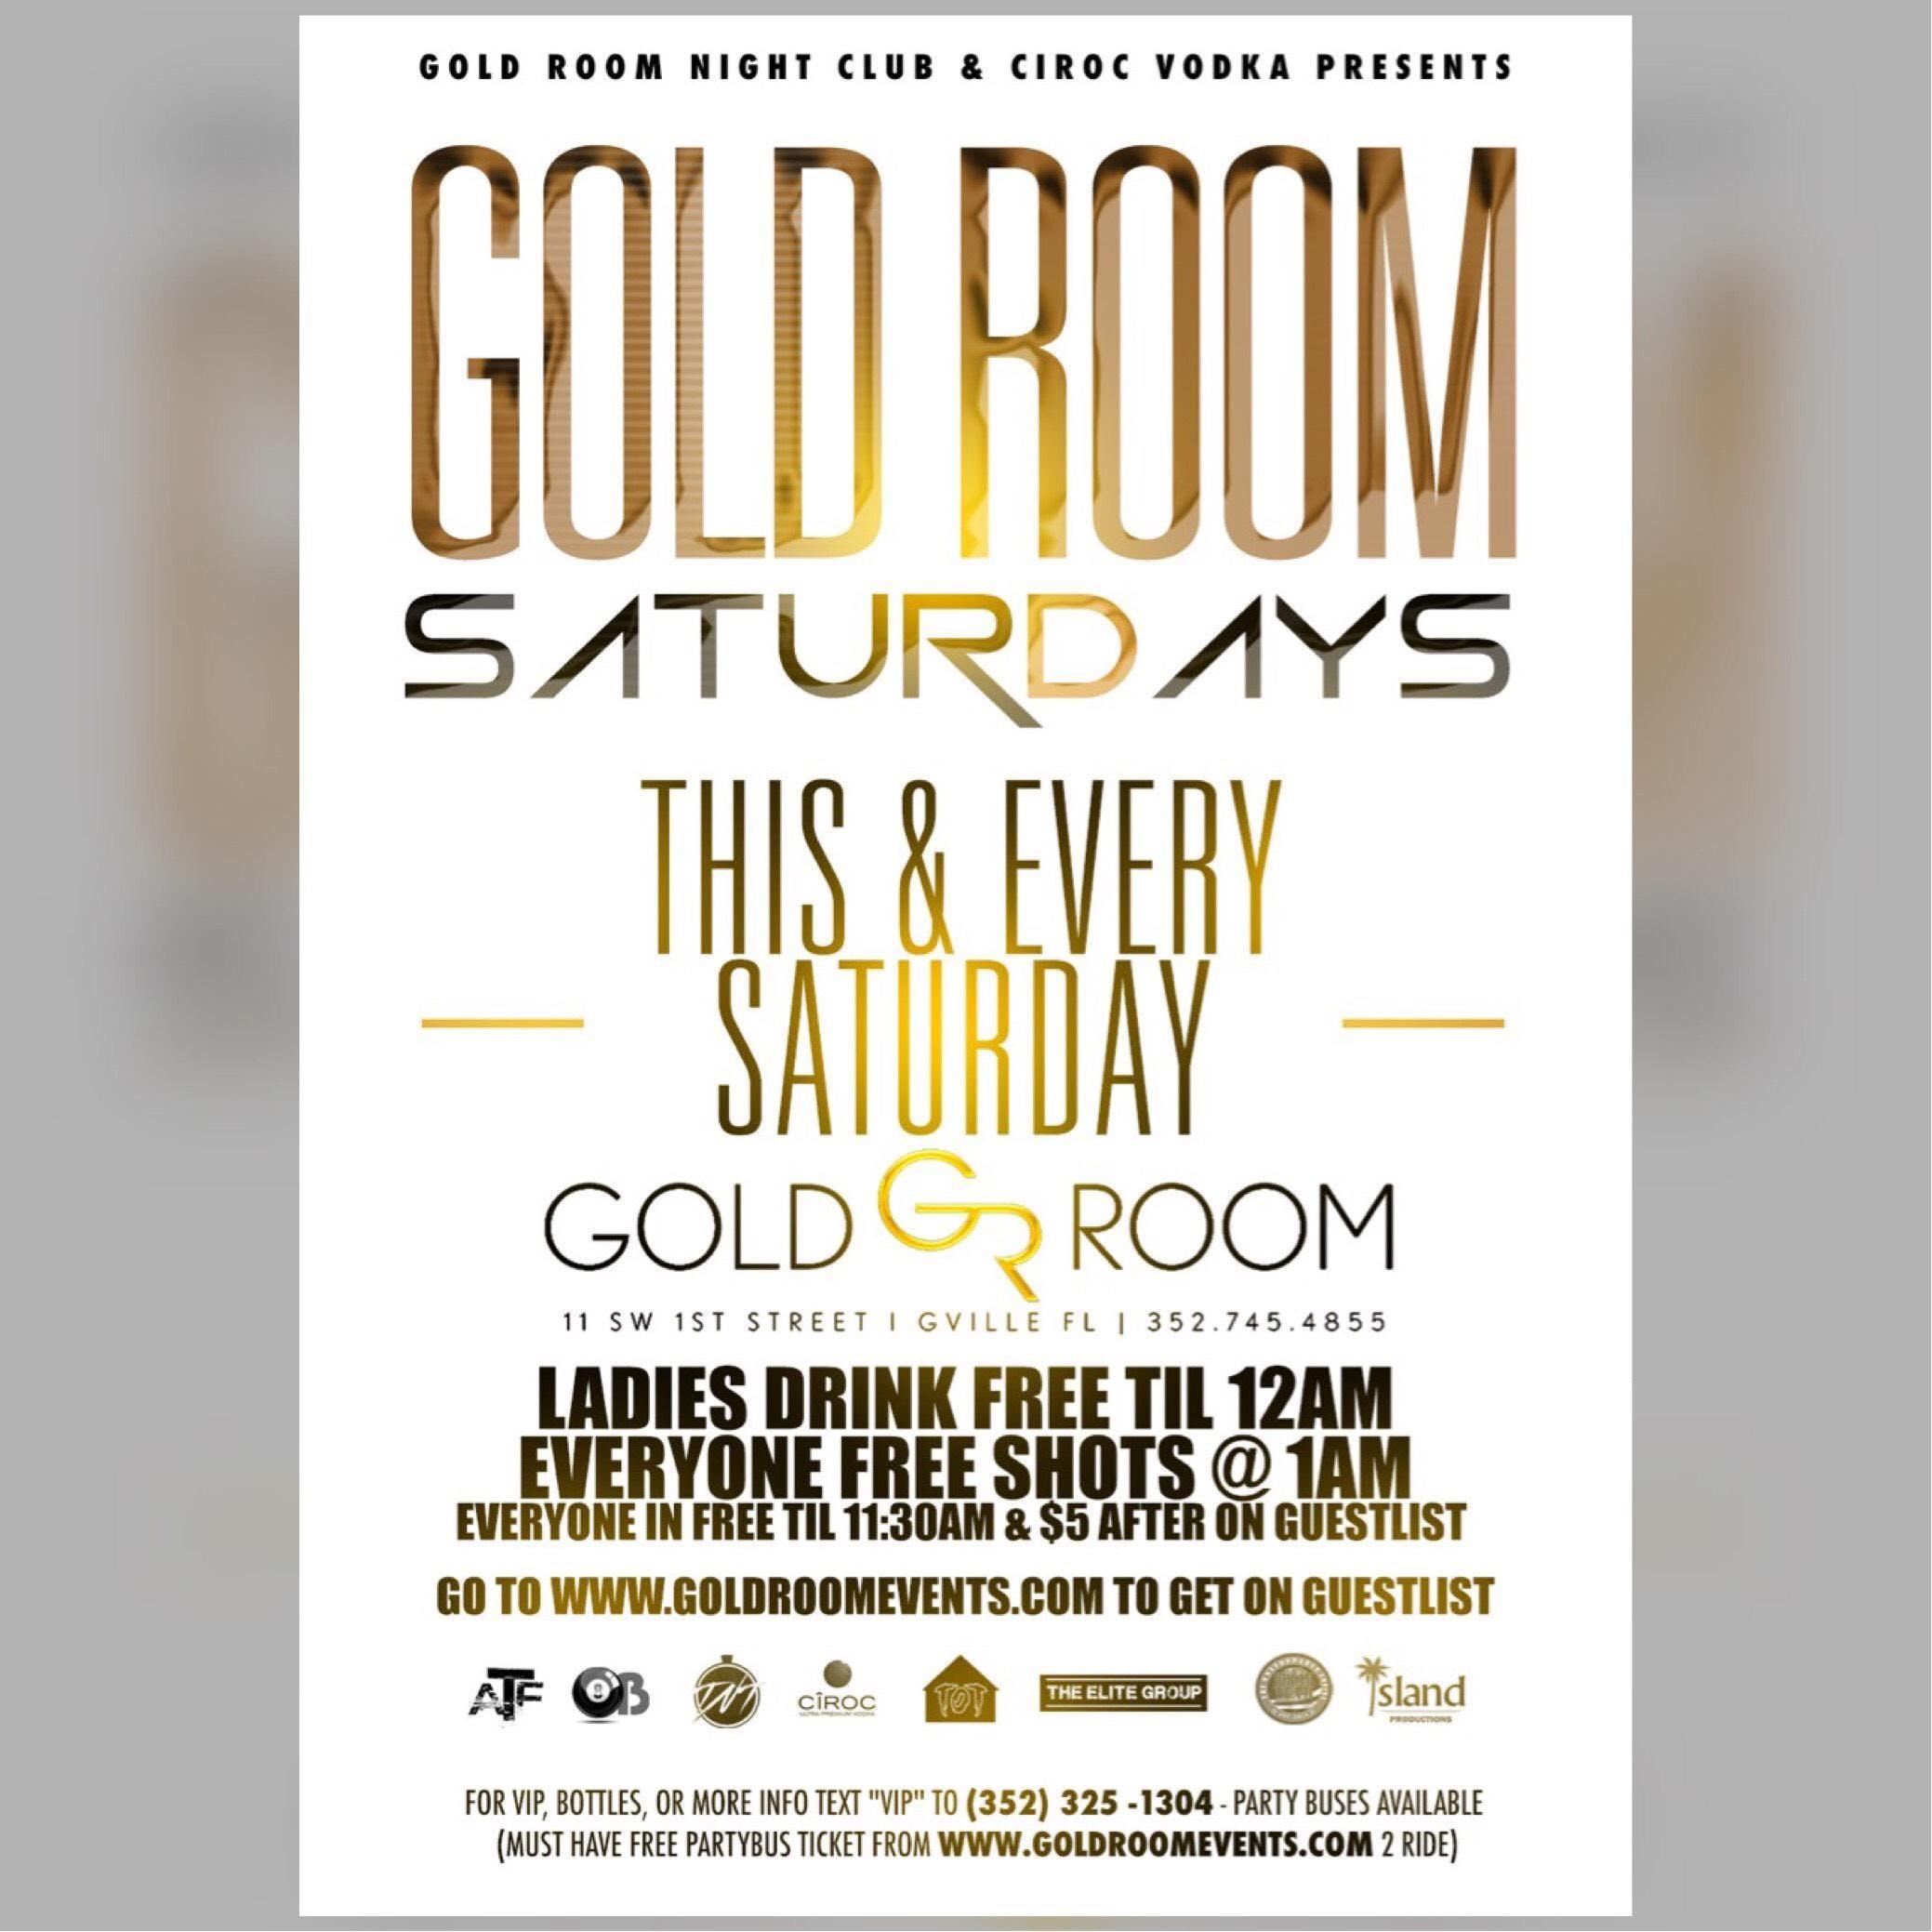 GOLD ROOM SATURDAYS (GUESTLIST FREE TIL 11:30